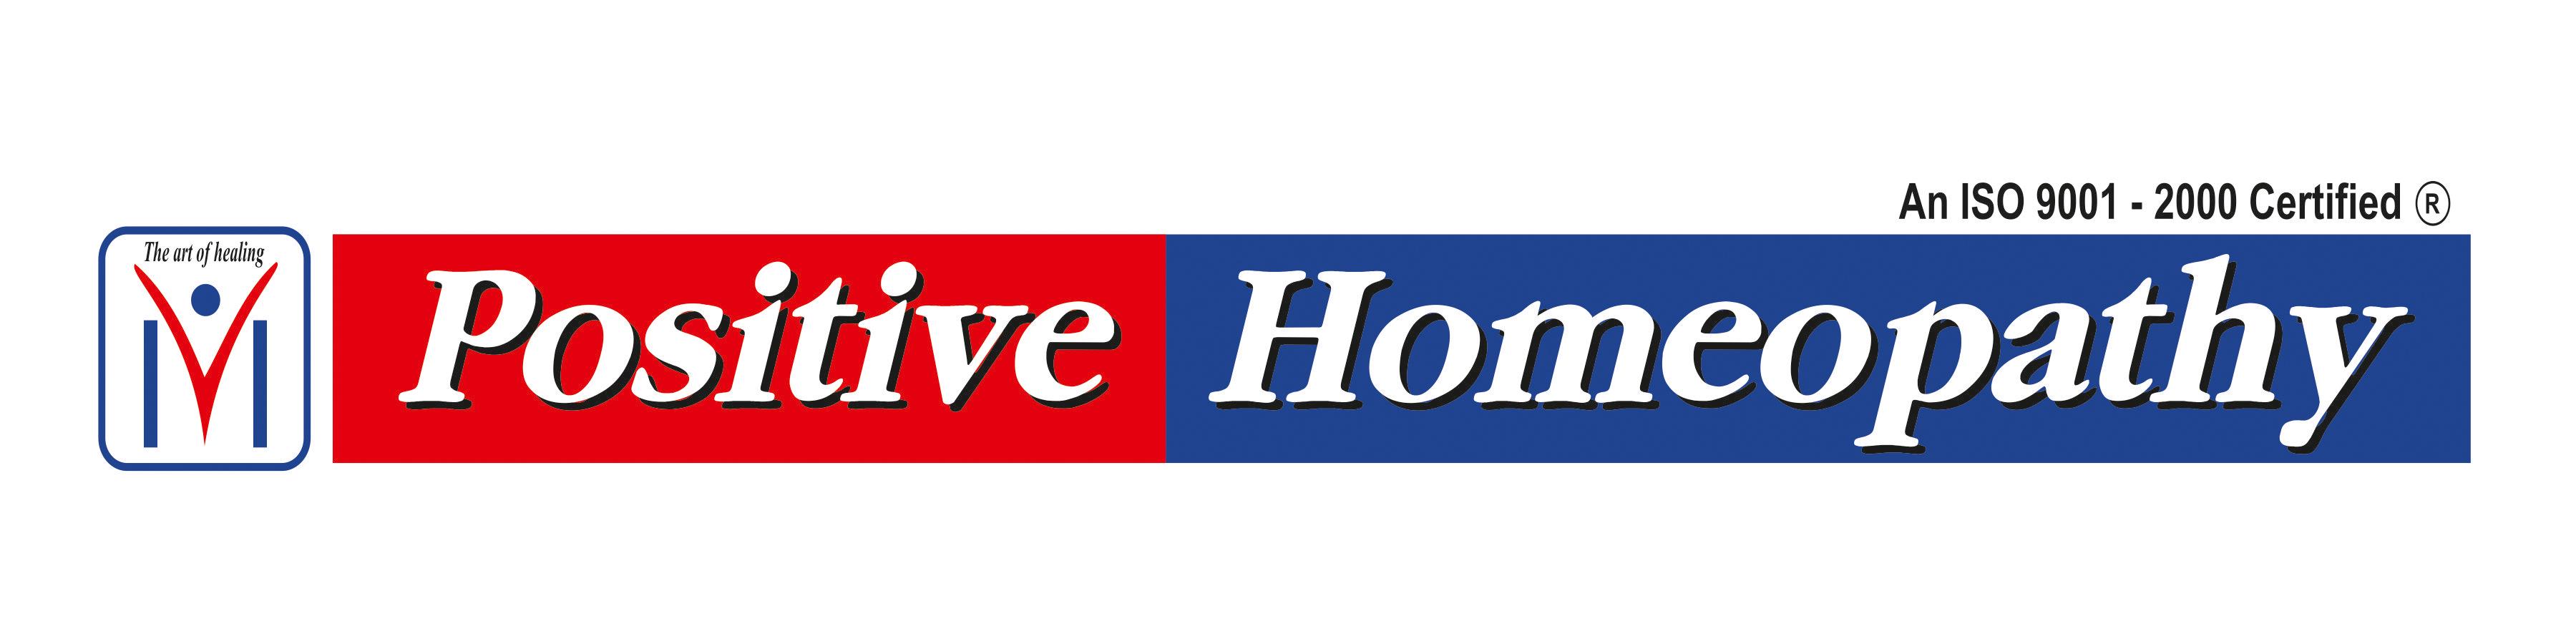 Positive Homeopathy - Ejipura - Bangalore Image